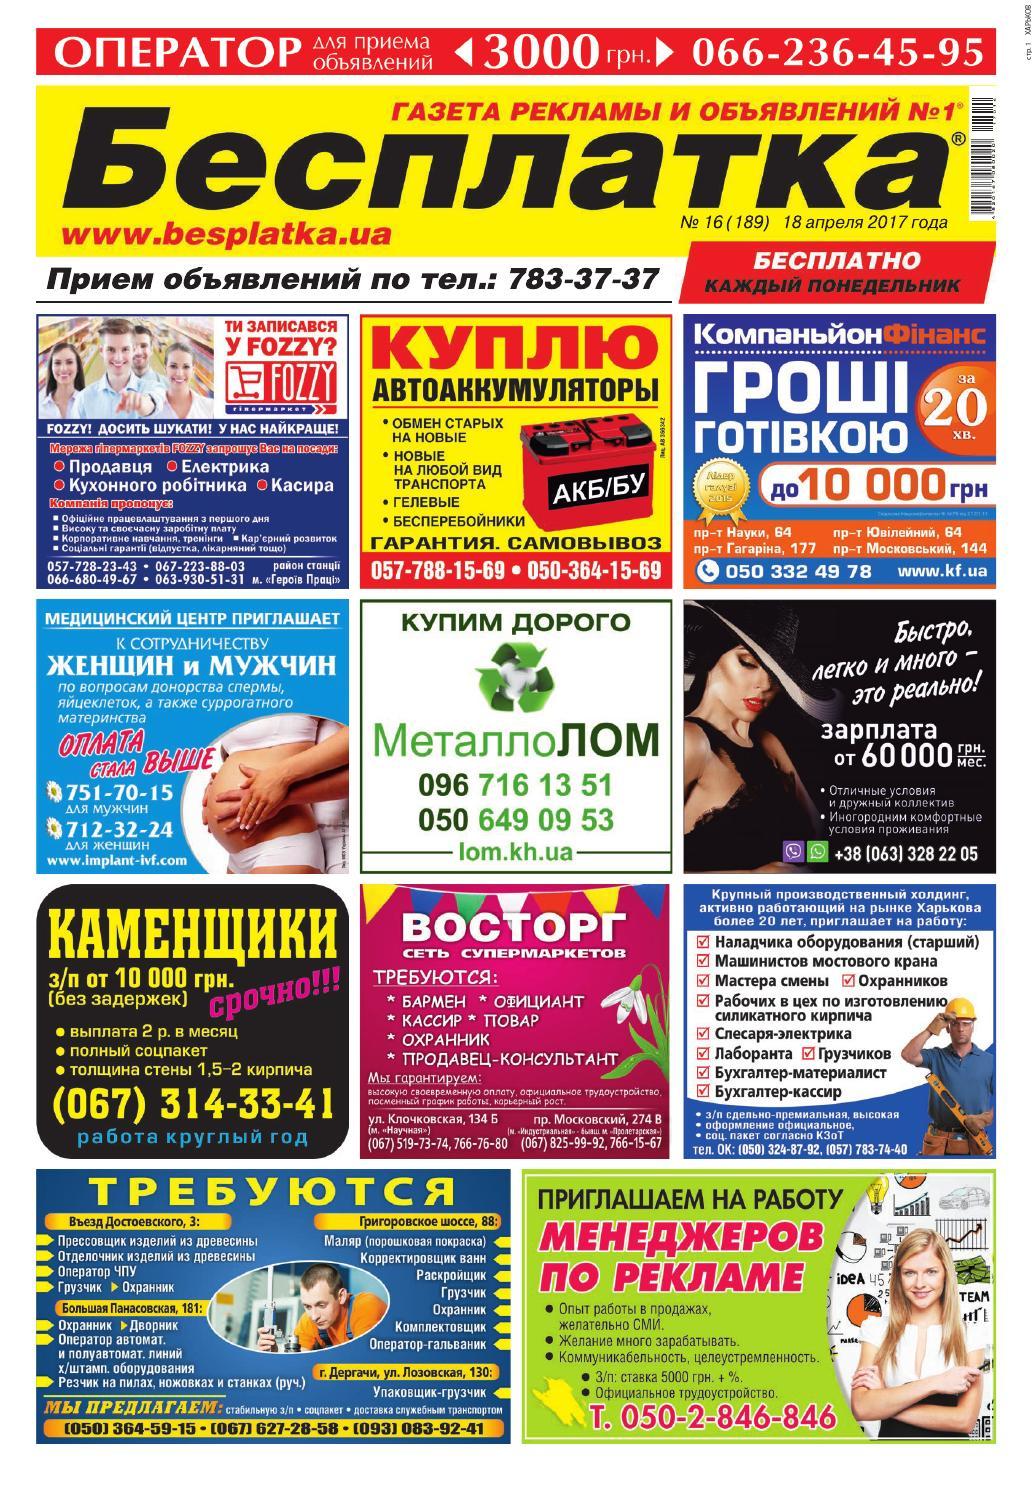 Besplatka  16 Харьков by besplatka ukraine - issuu af0e093a57c